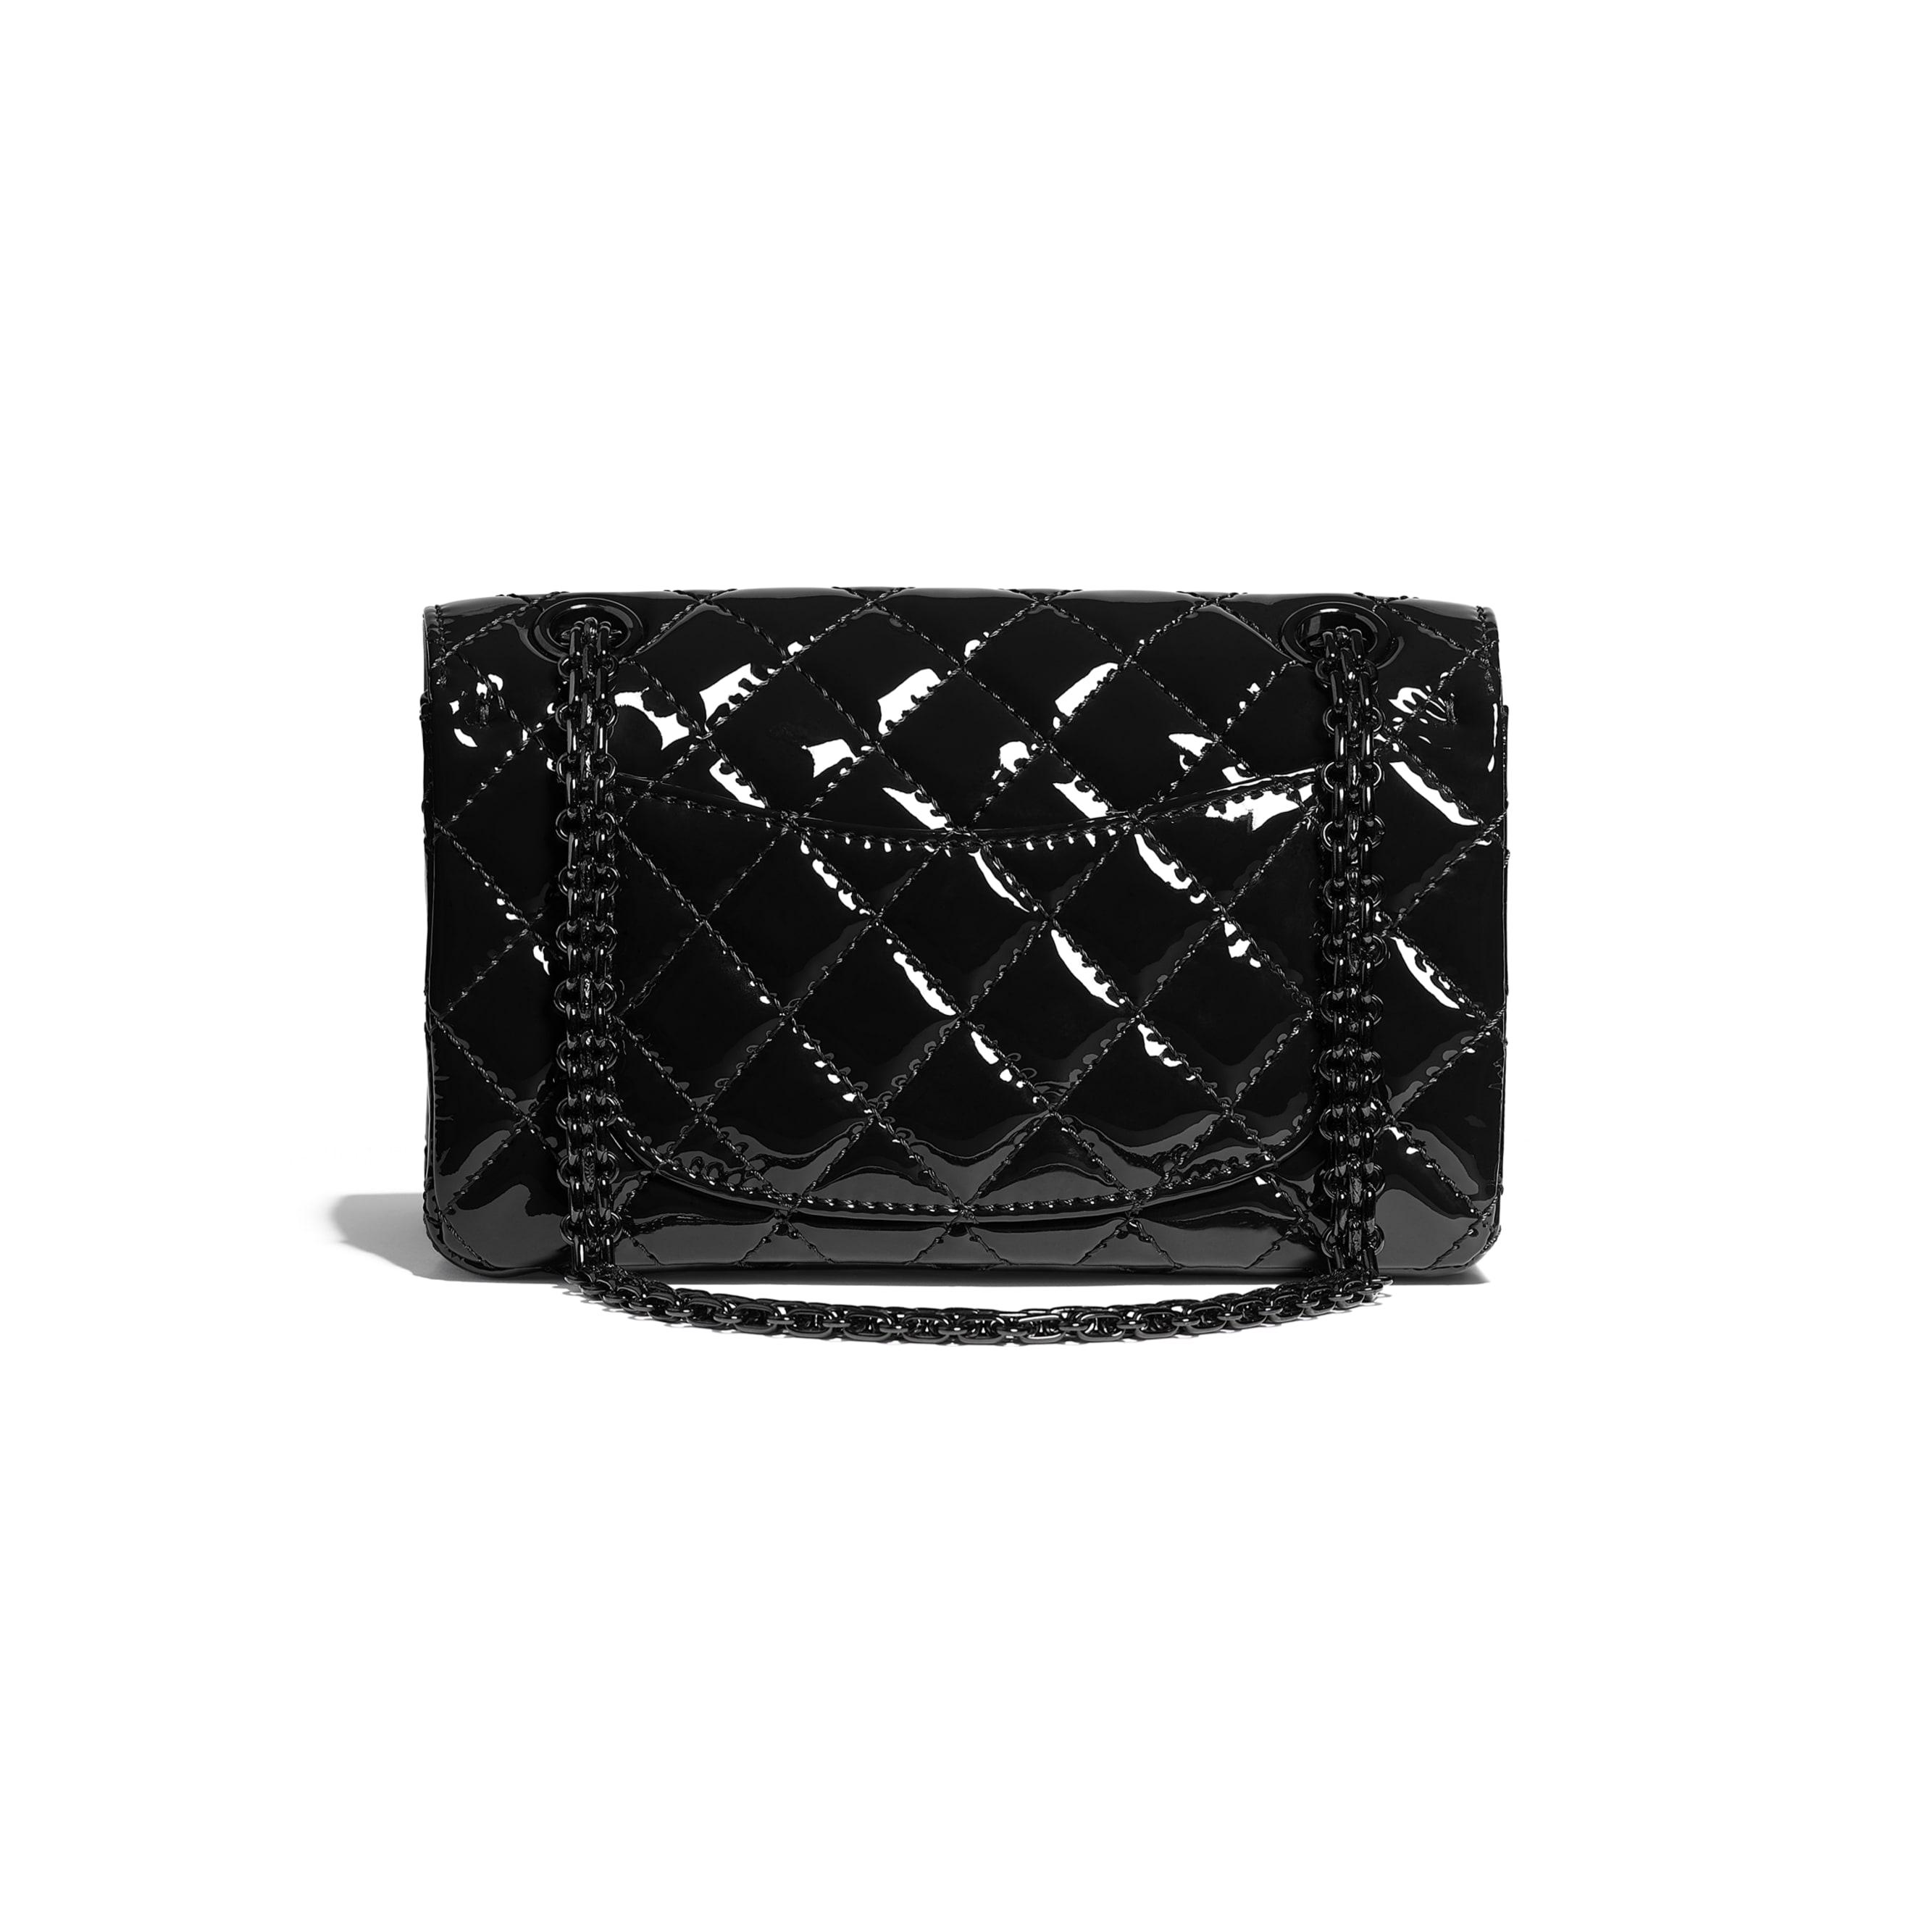 Mini 2.55 Handbag - Black - Patent Calfskin & Black Metal - CHANEL - Alternative view - see standard sized version